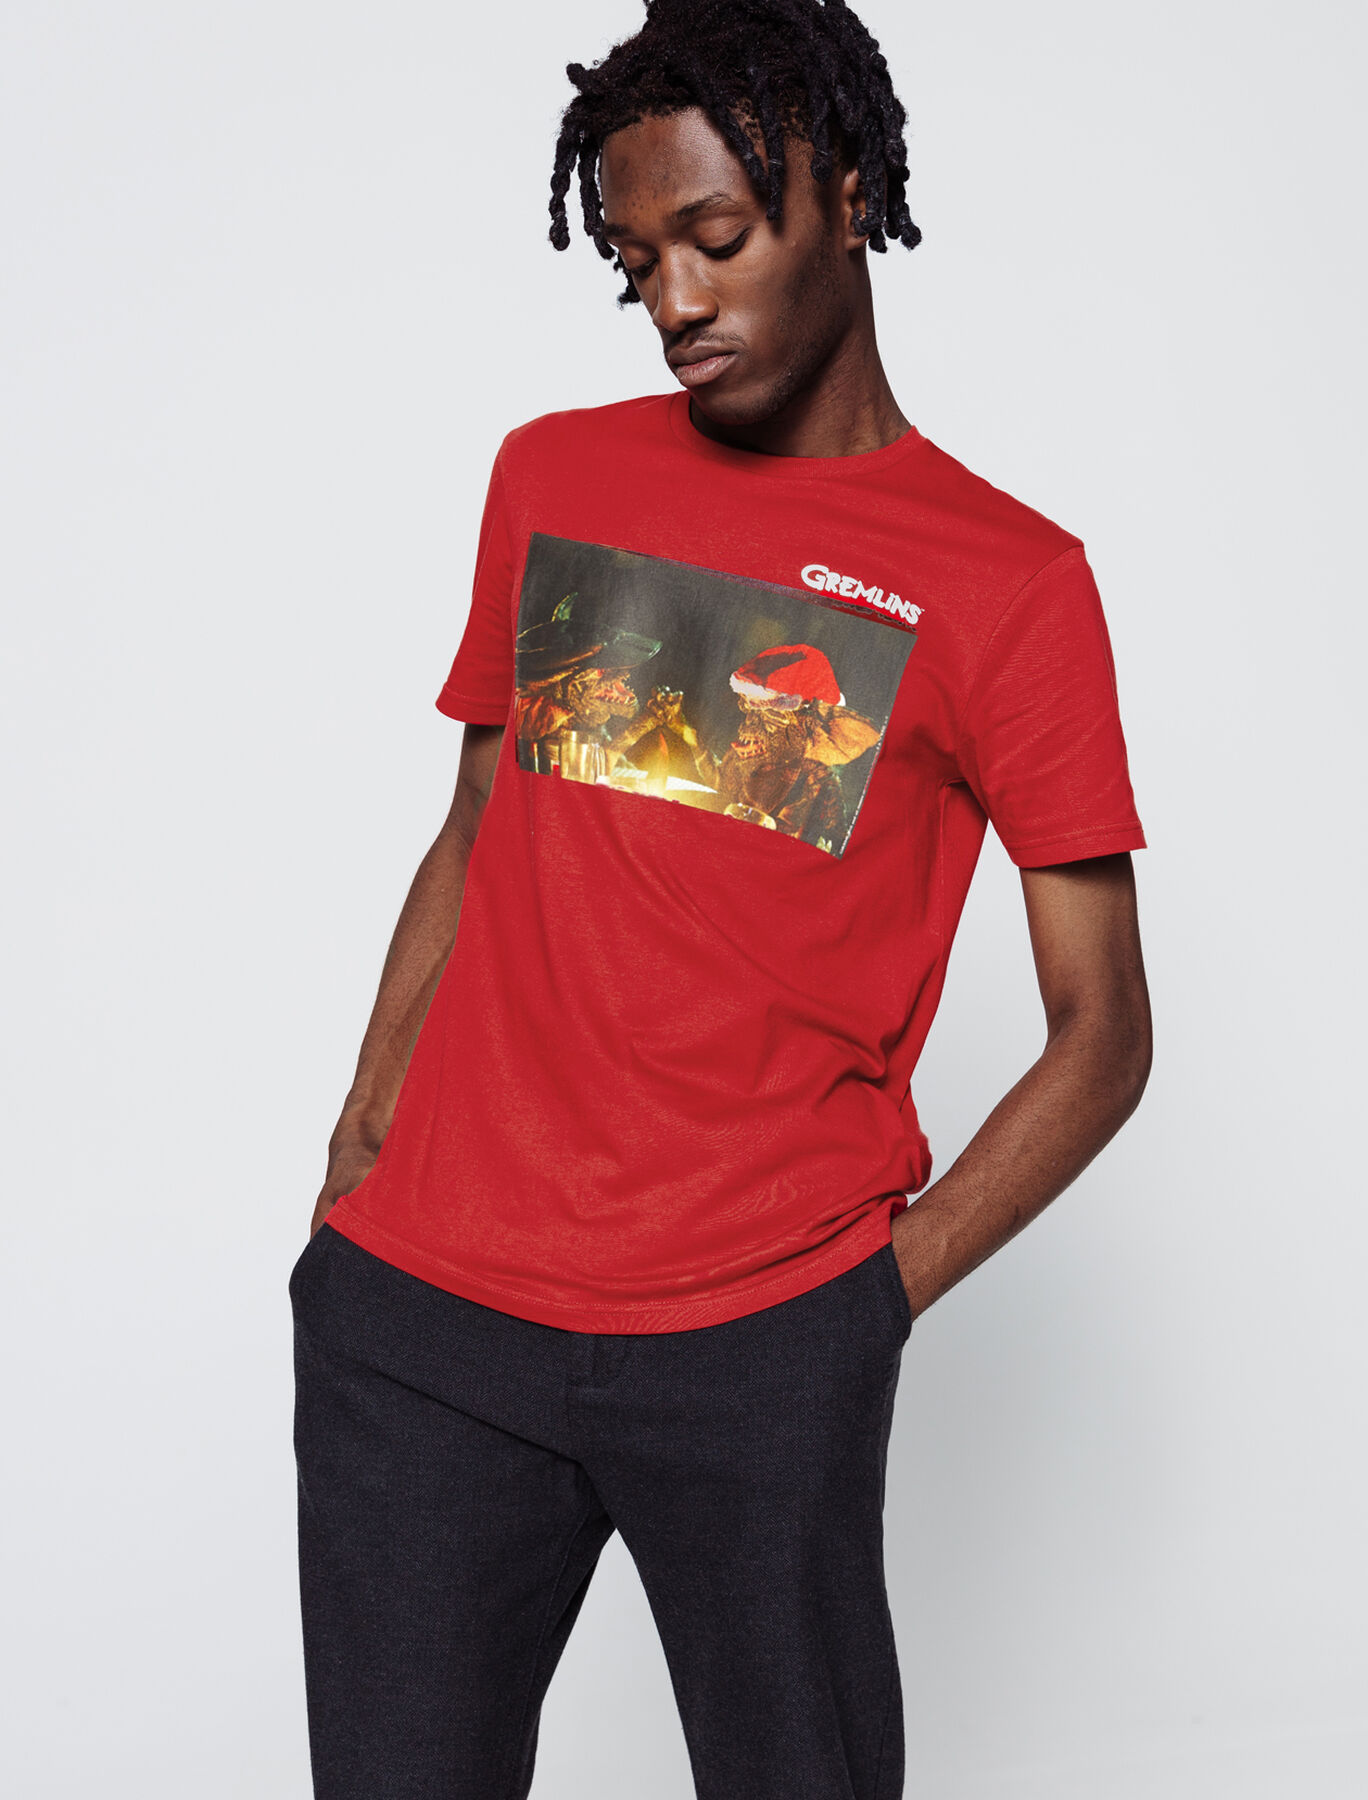 T-shirt Gremlins 2